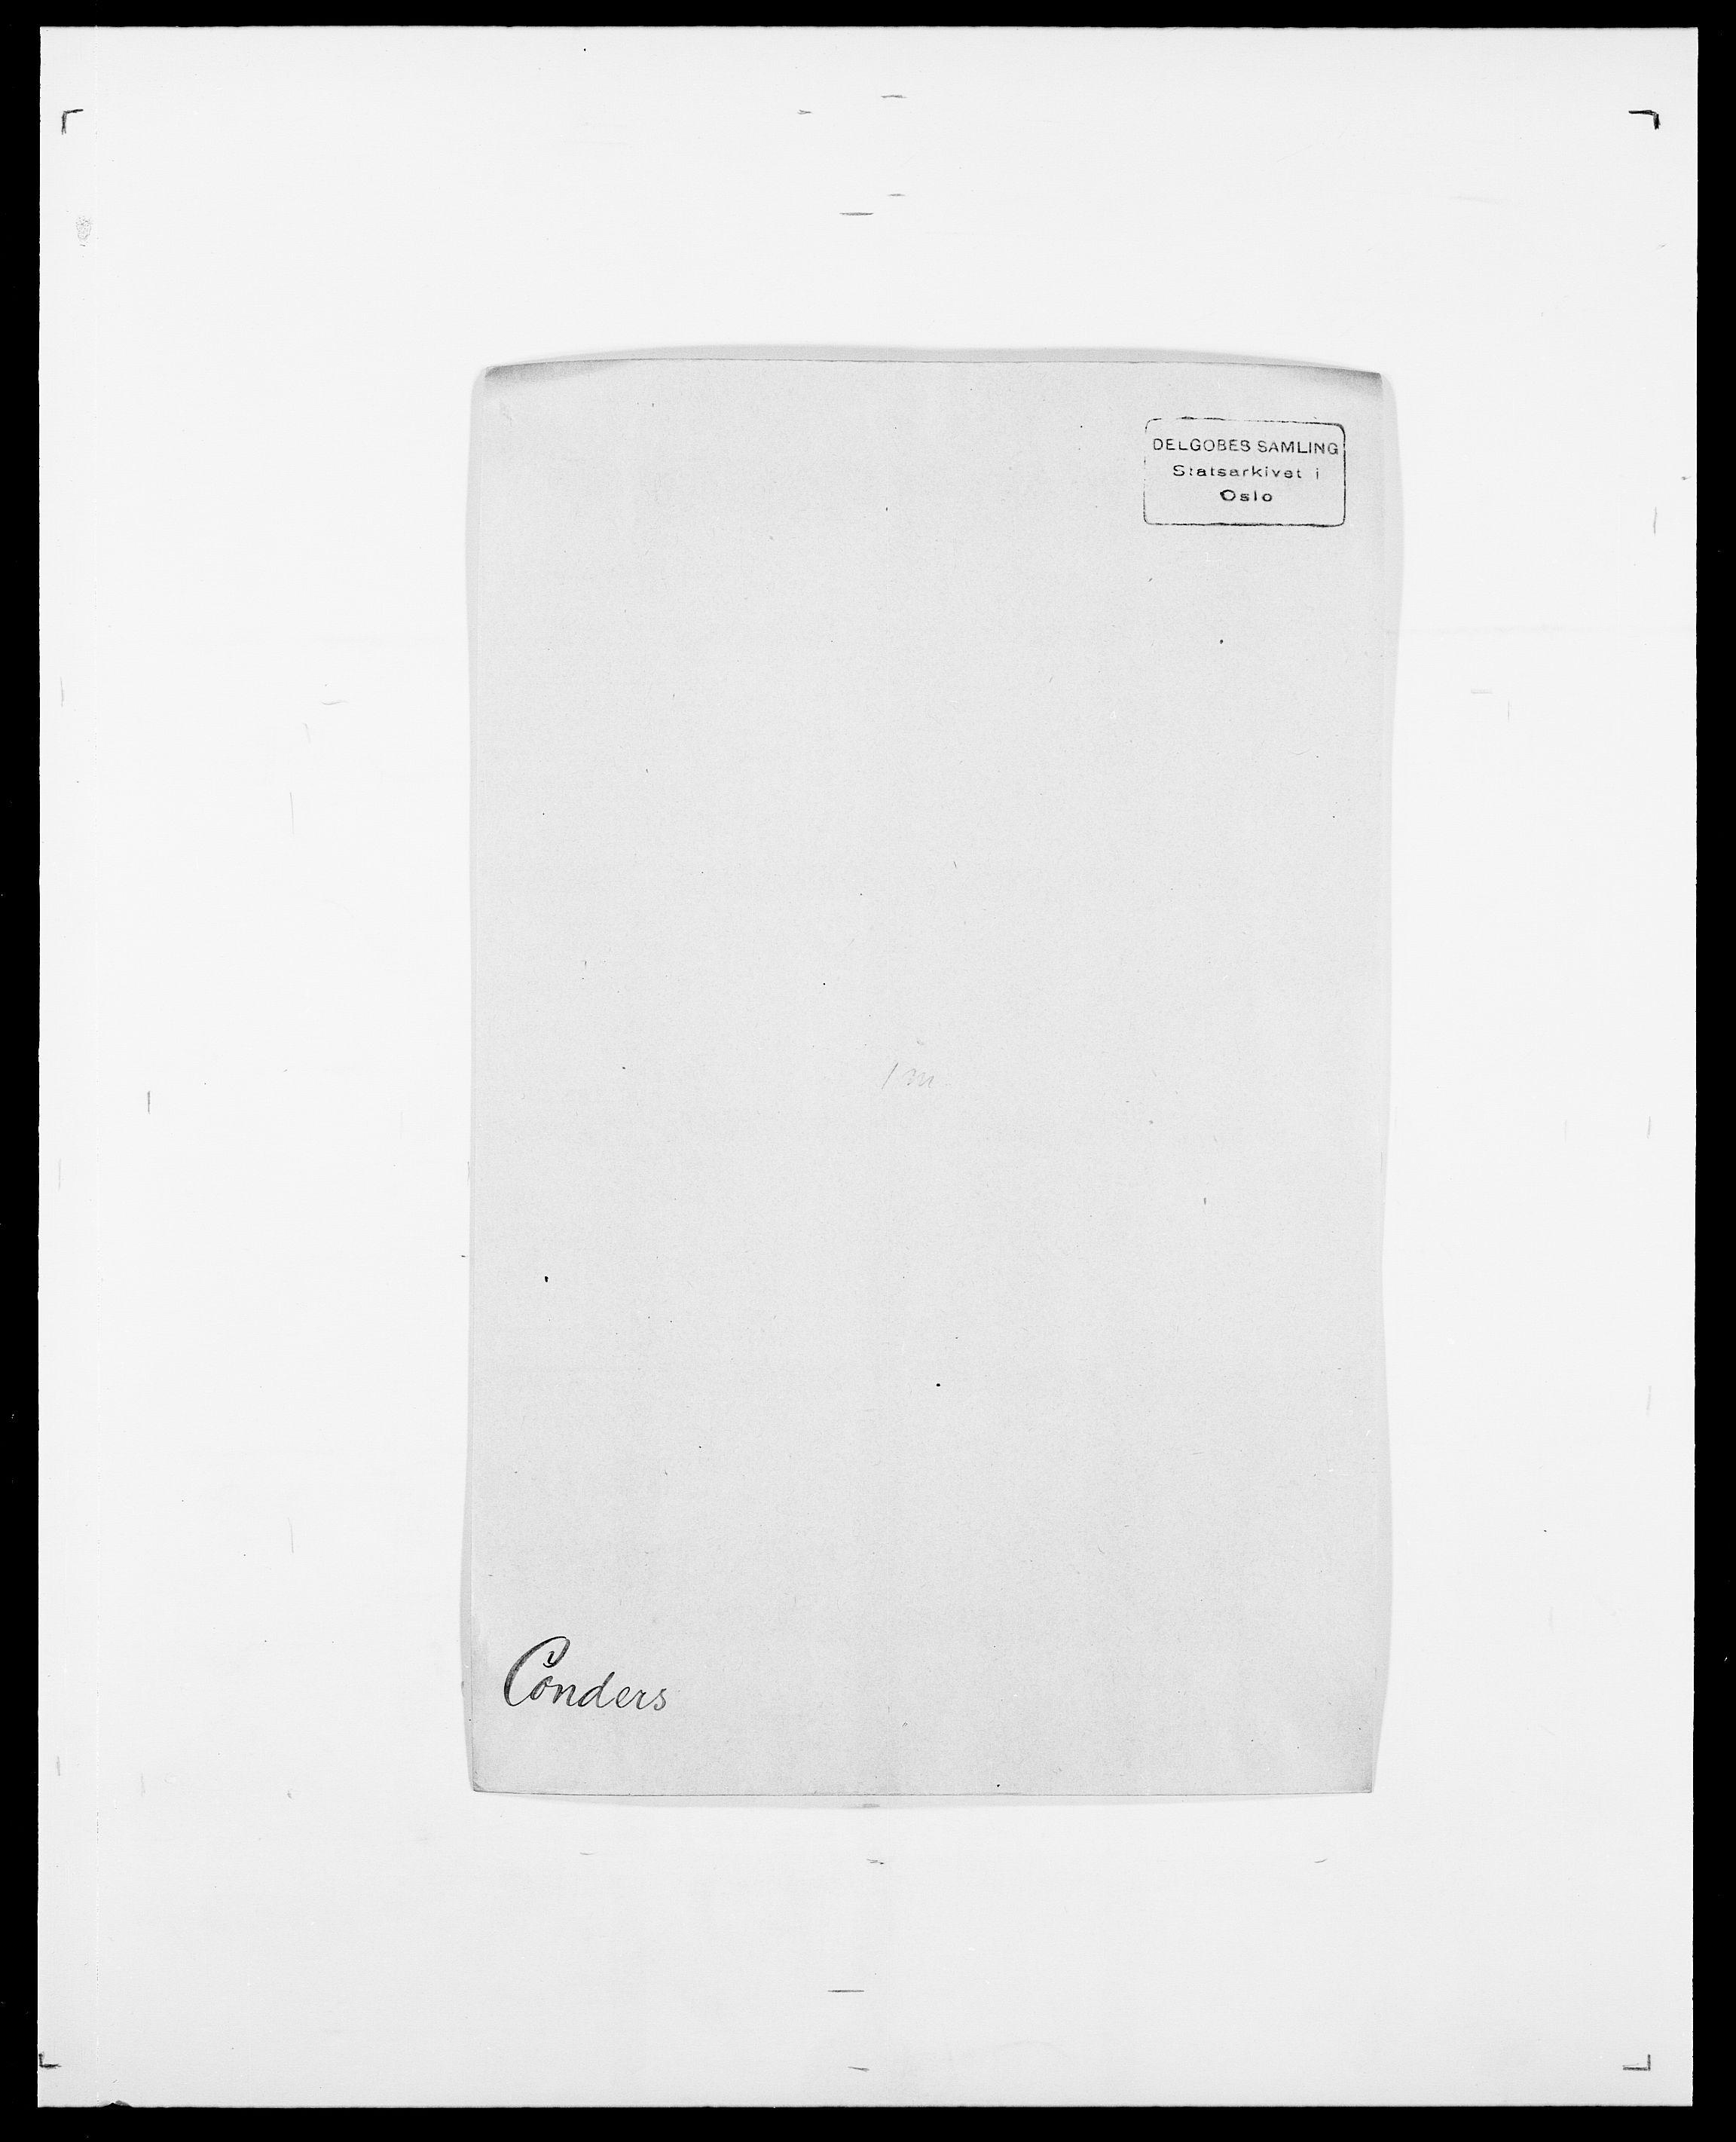 SAO, Delgobe, Charles Antoine - samling, D/Da/L0008: Capjon - Dagenbolt, s. 494